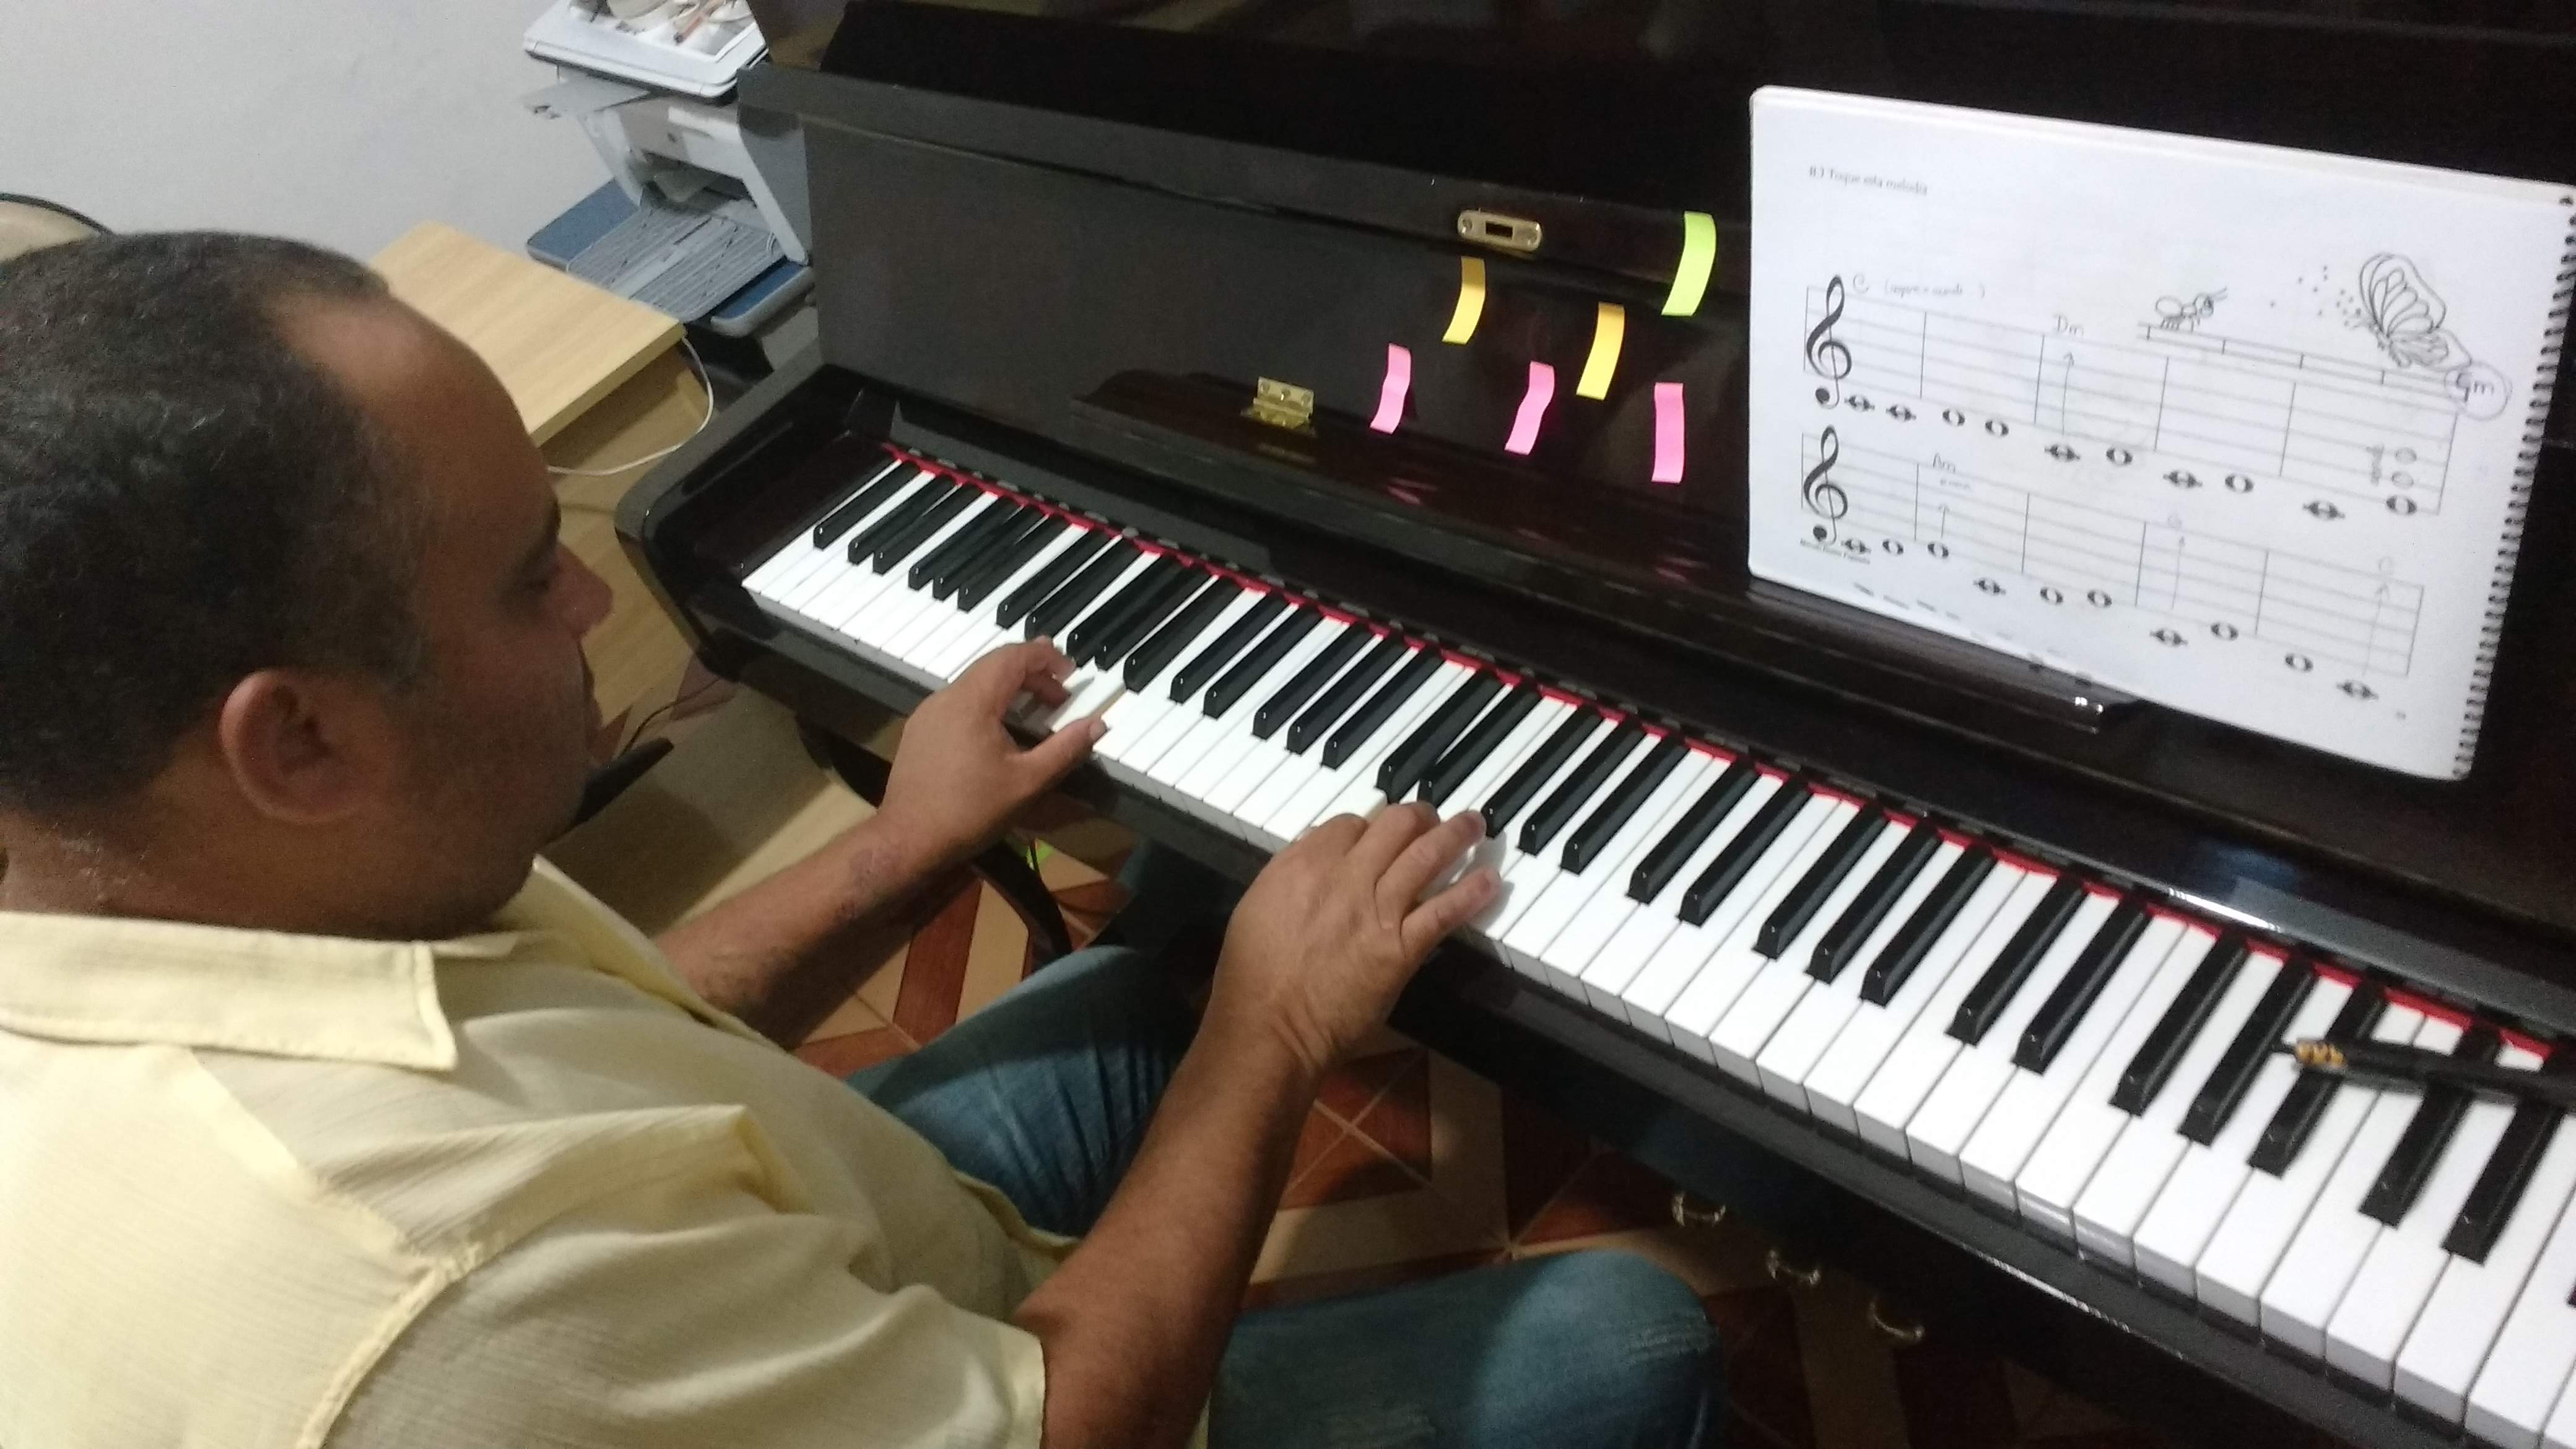 aprenda teclado do zero em jf professora luciane